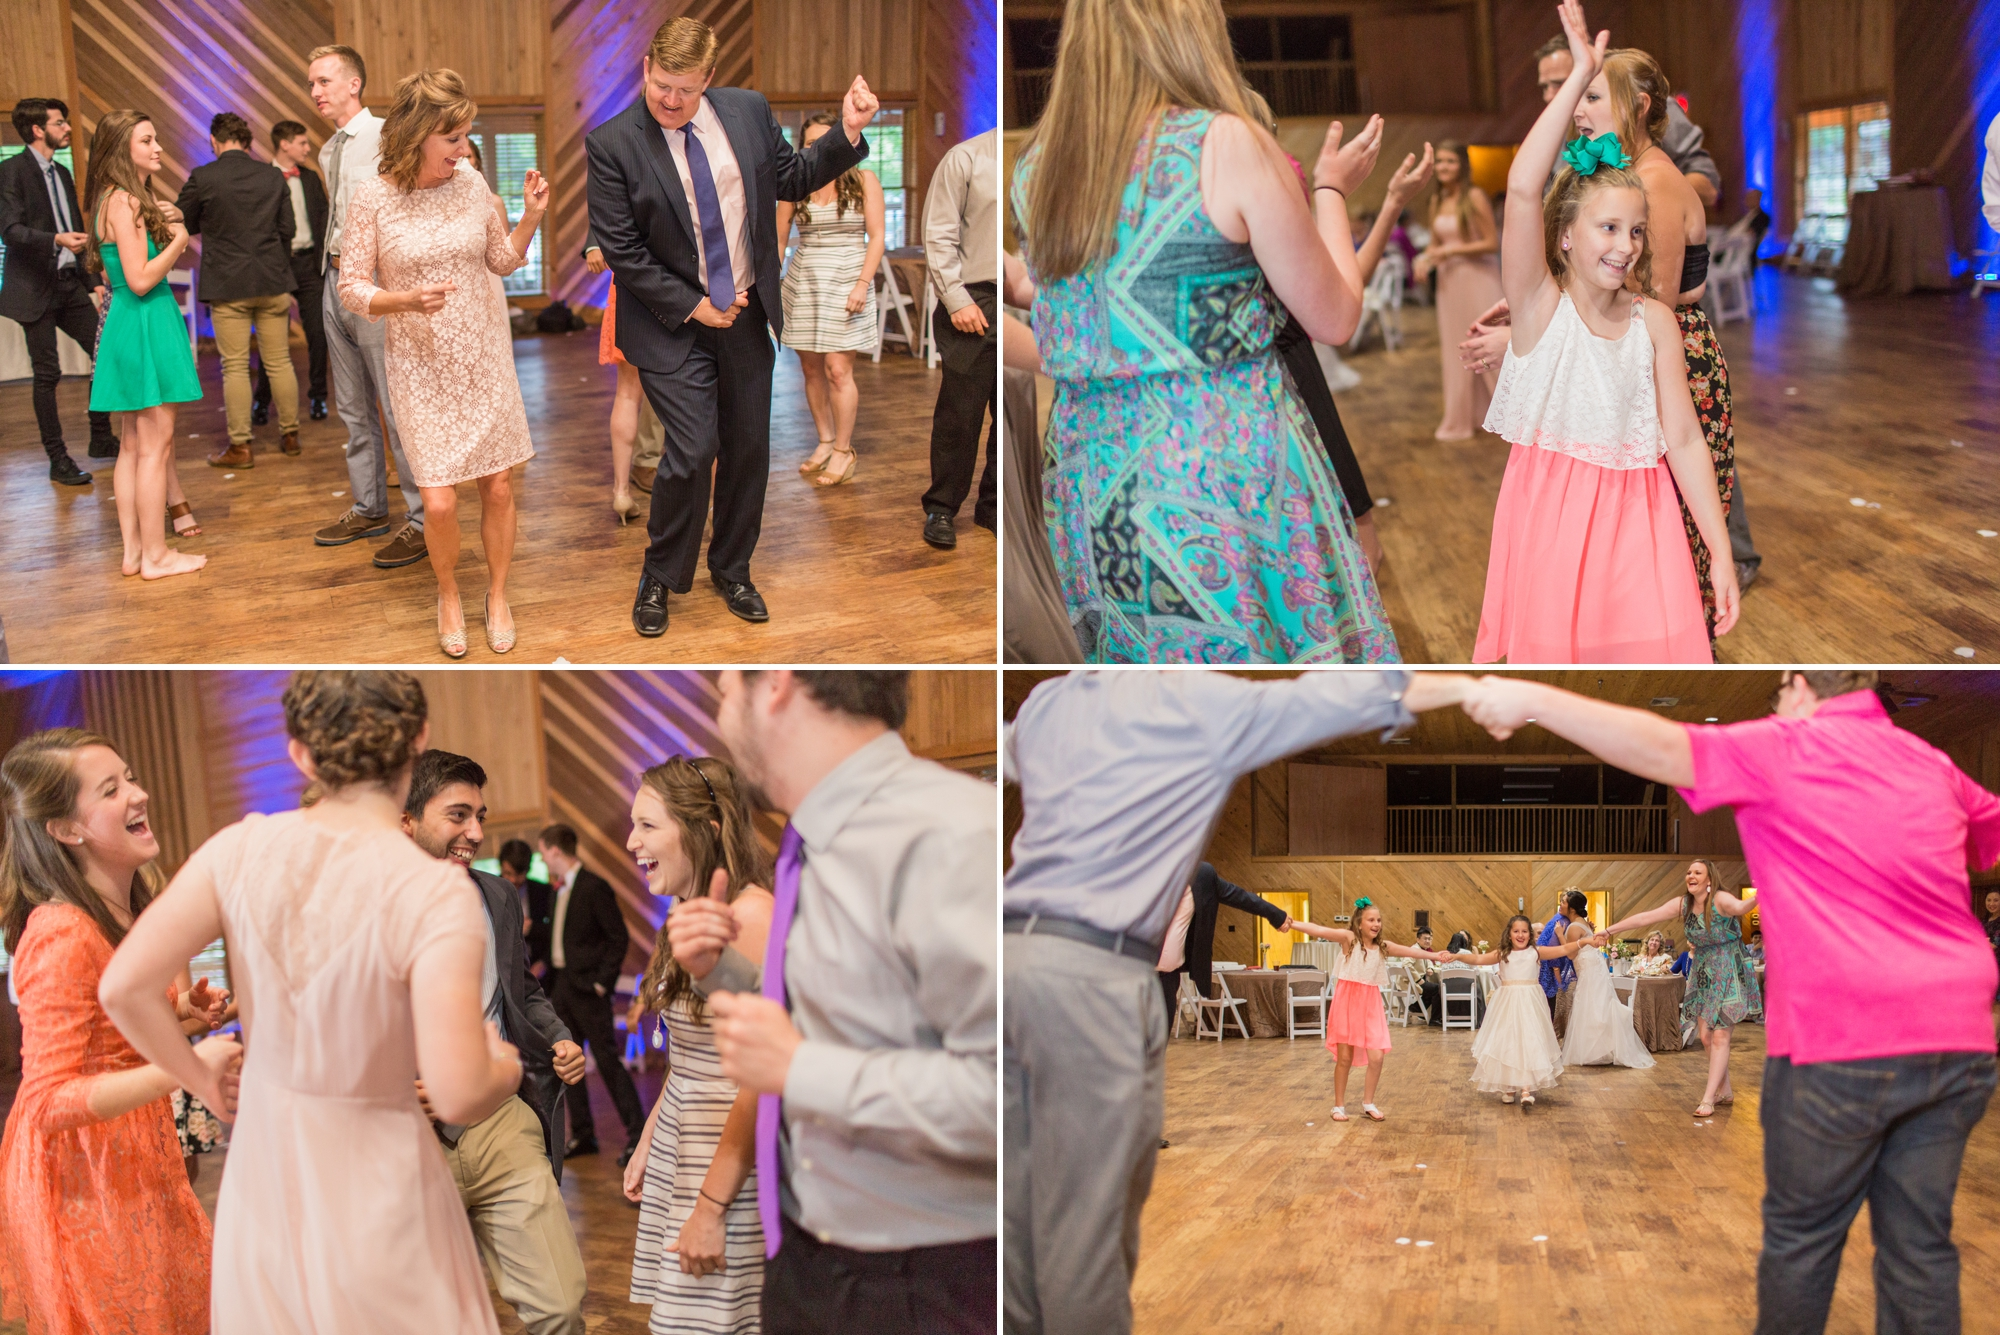 giles wedding blog 44.jpg